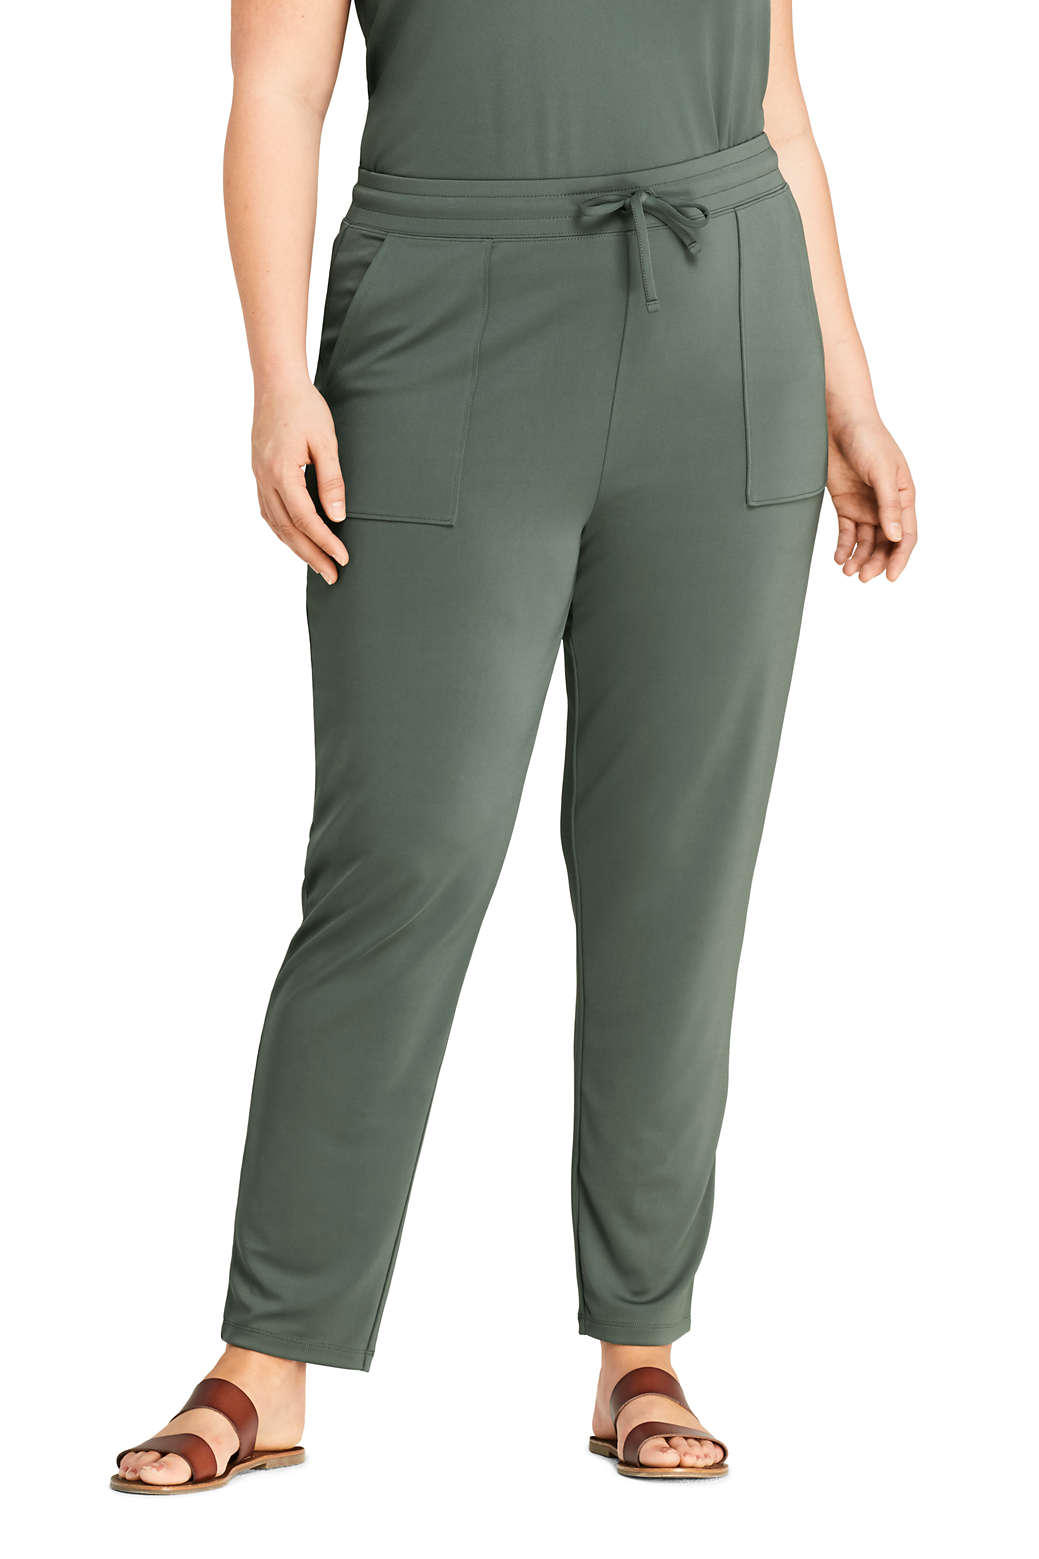 4d9af70846 Women s Plus Size Matte Jersey Drawstring Jogger Pants from Lands  End